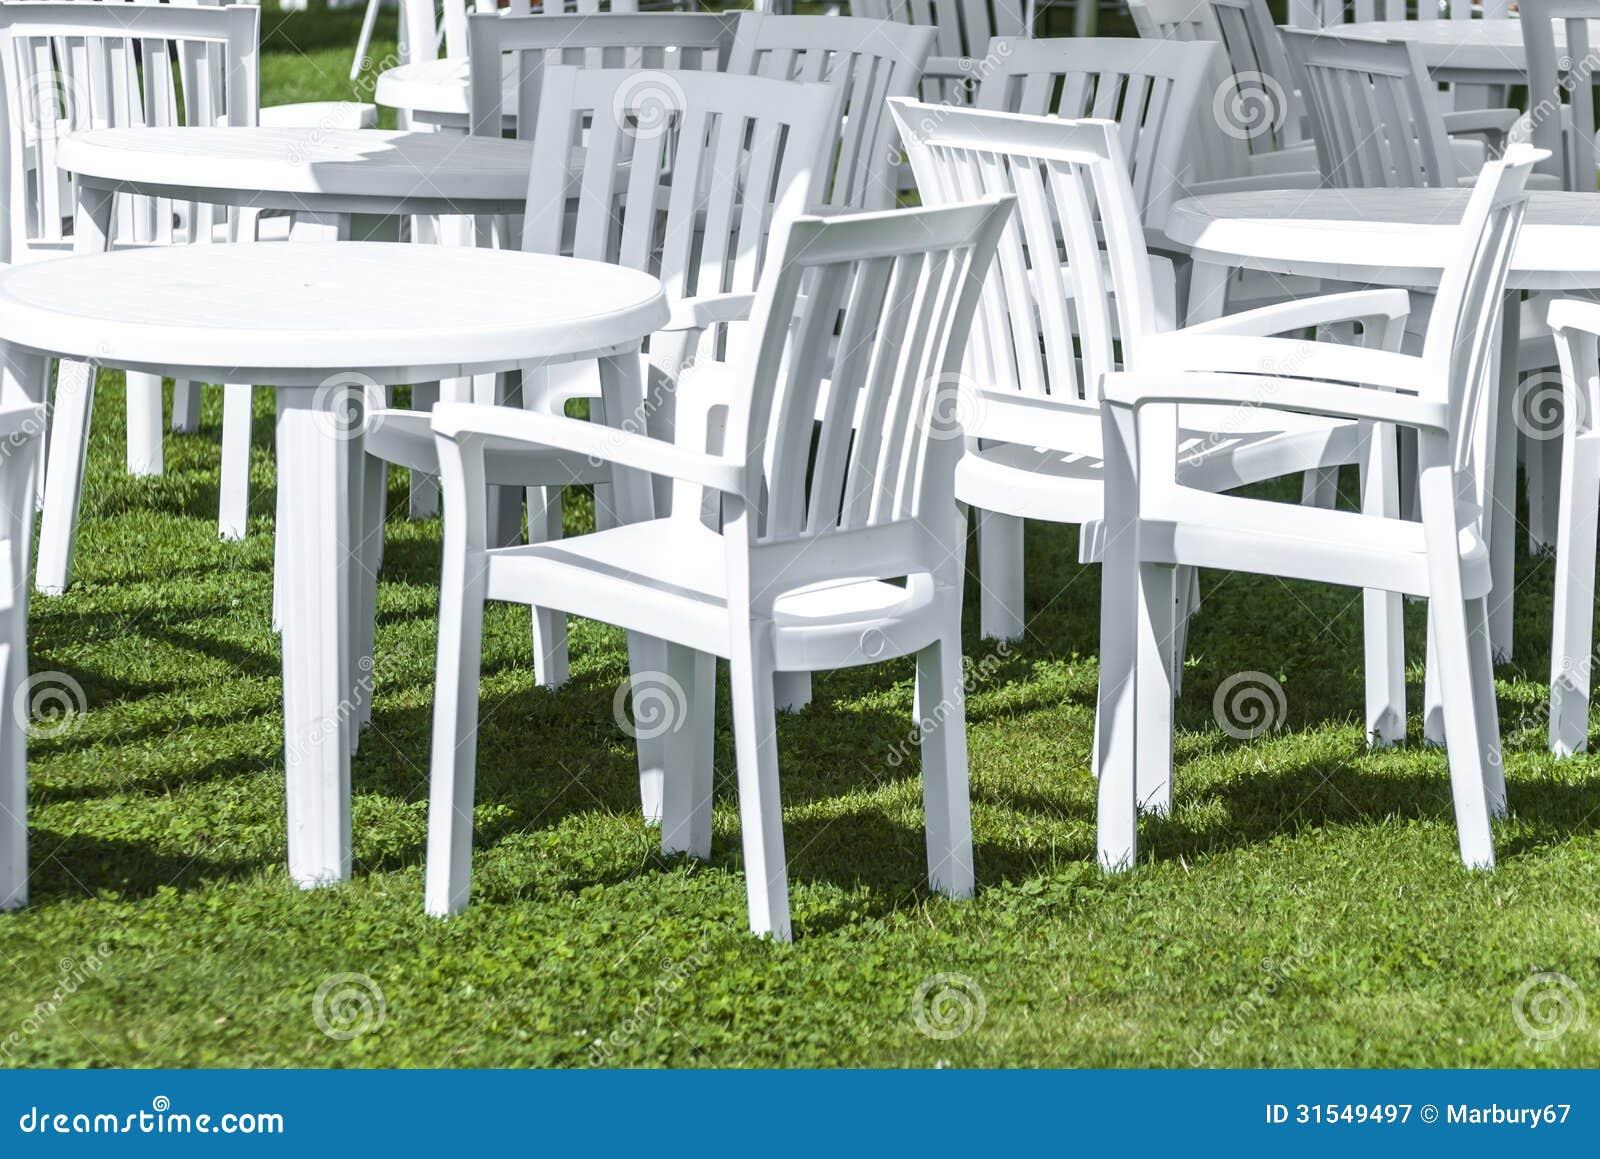 Mobiliario Jardin Plastico Of Muebles De Jardin De Plastico Dise Os Arquitect Nicos